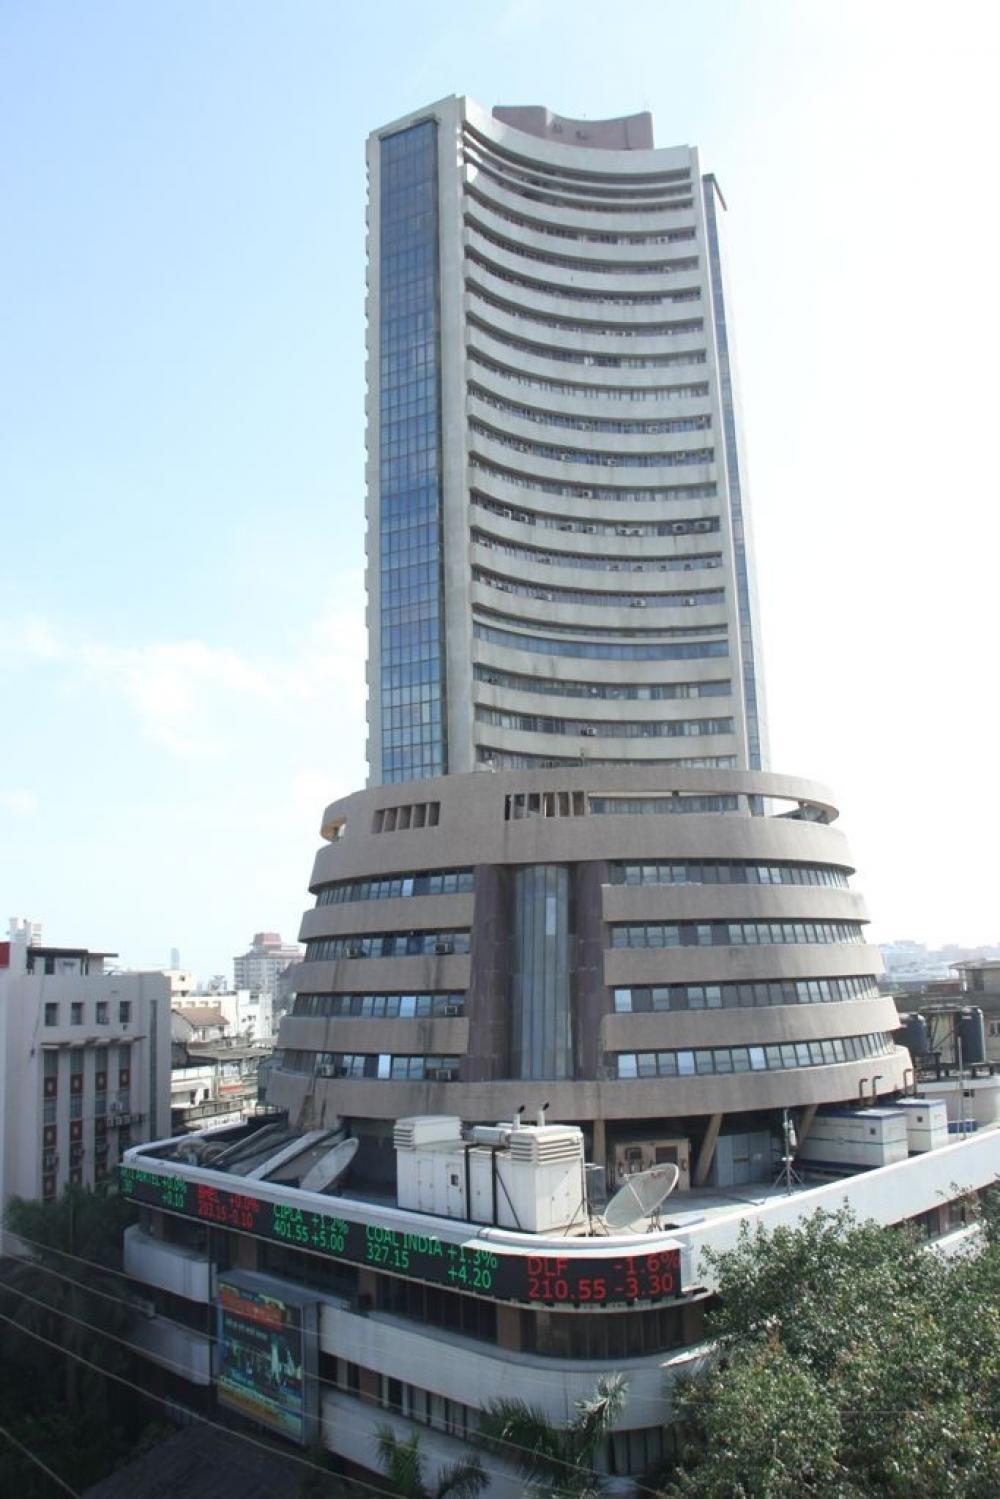 The Weekend Leader - Positive macros push equities higher; power stocks rise